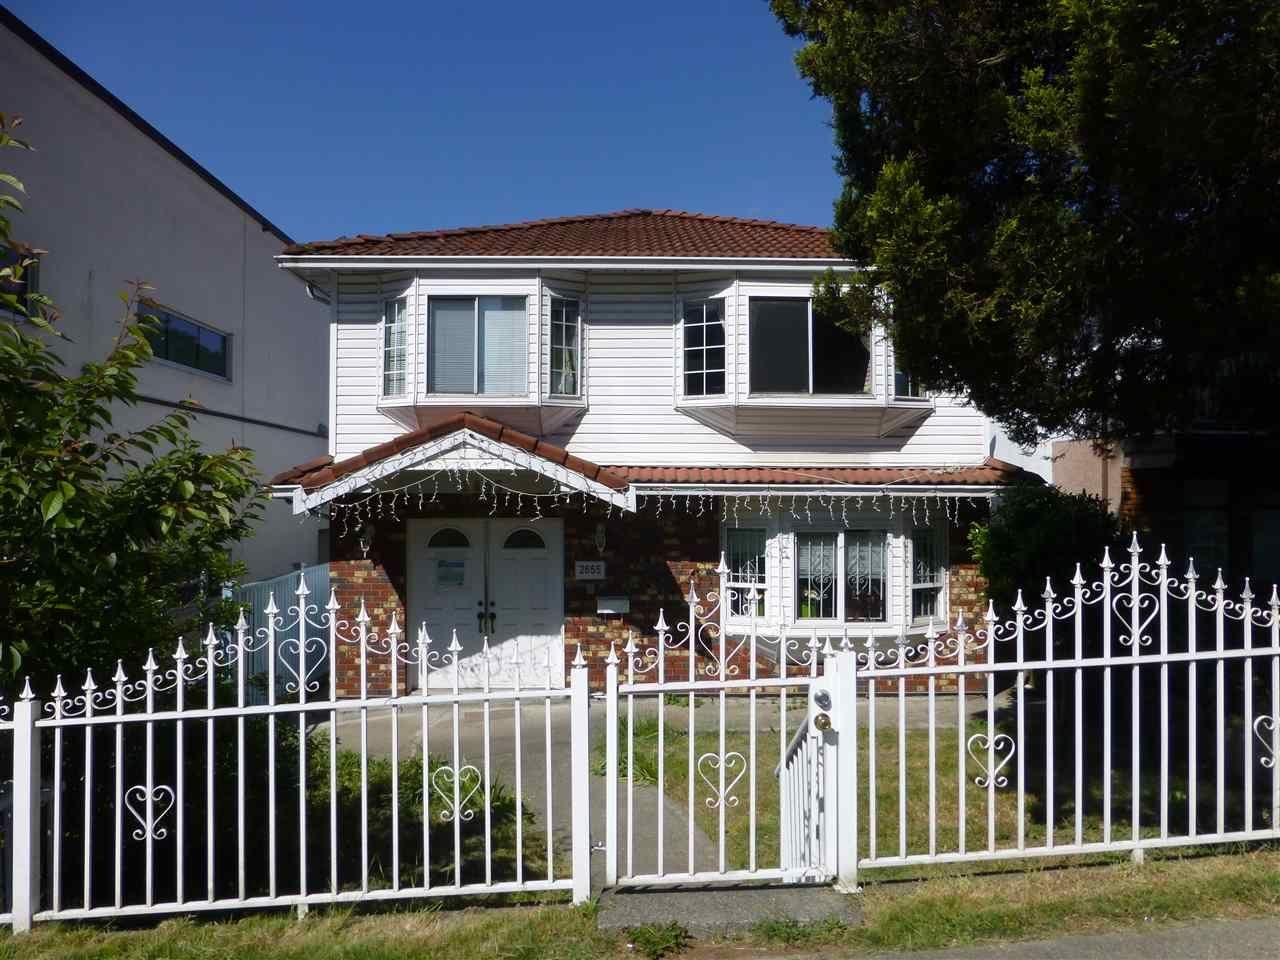 Main Photo: 2655 RENFREW STREET in Vancouver: Renfrew VE House for sale (Vancouver East)  : MLS®# R2067647